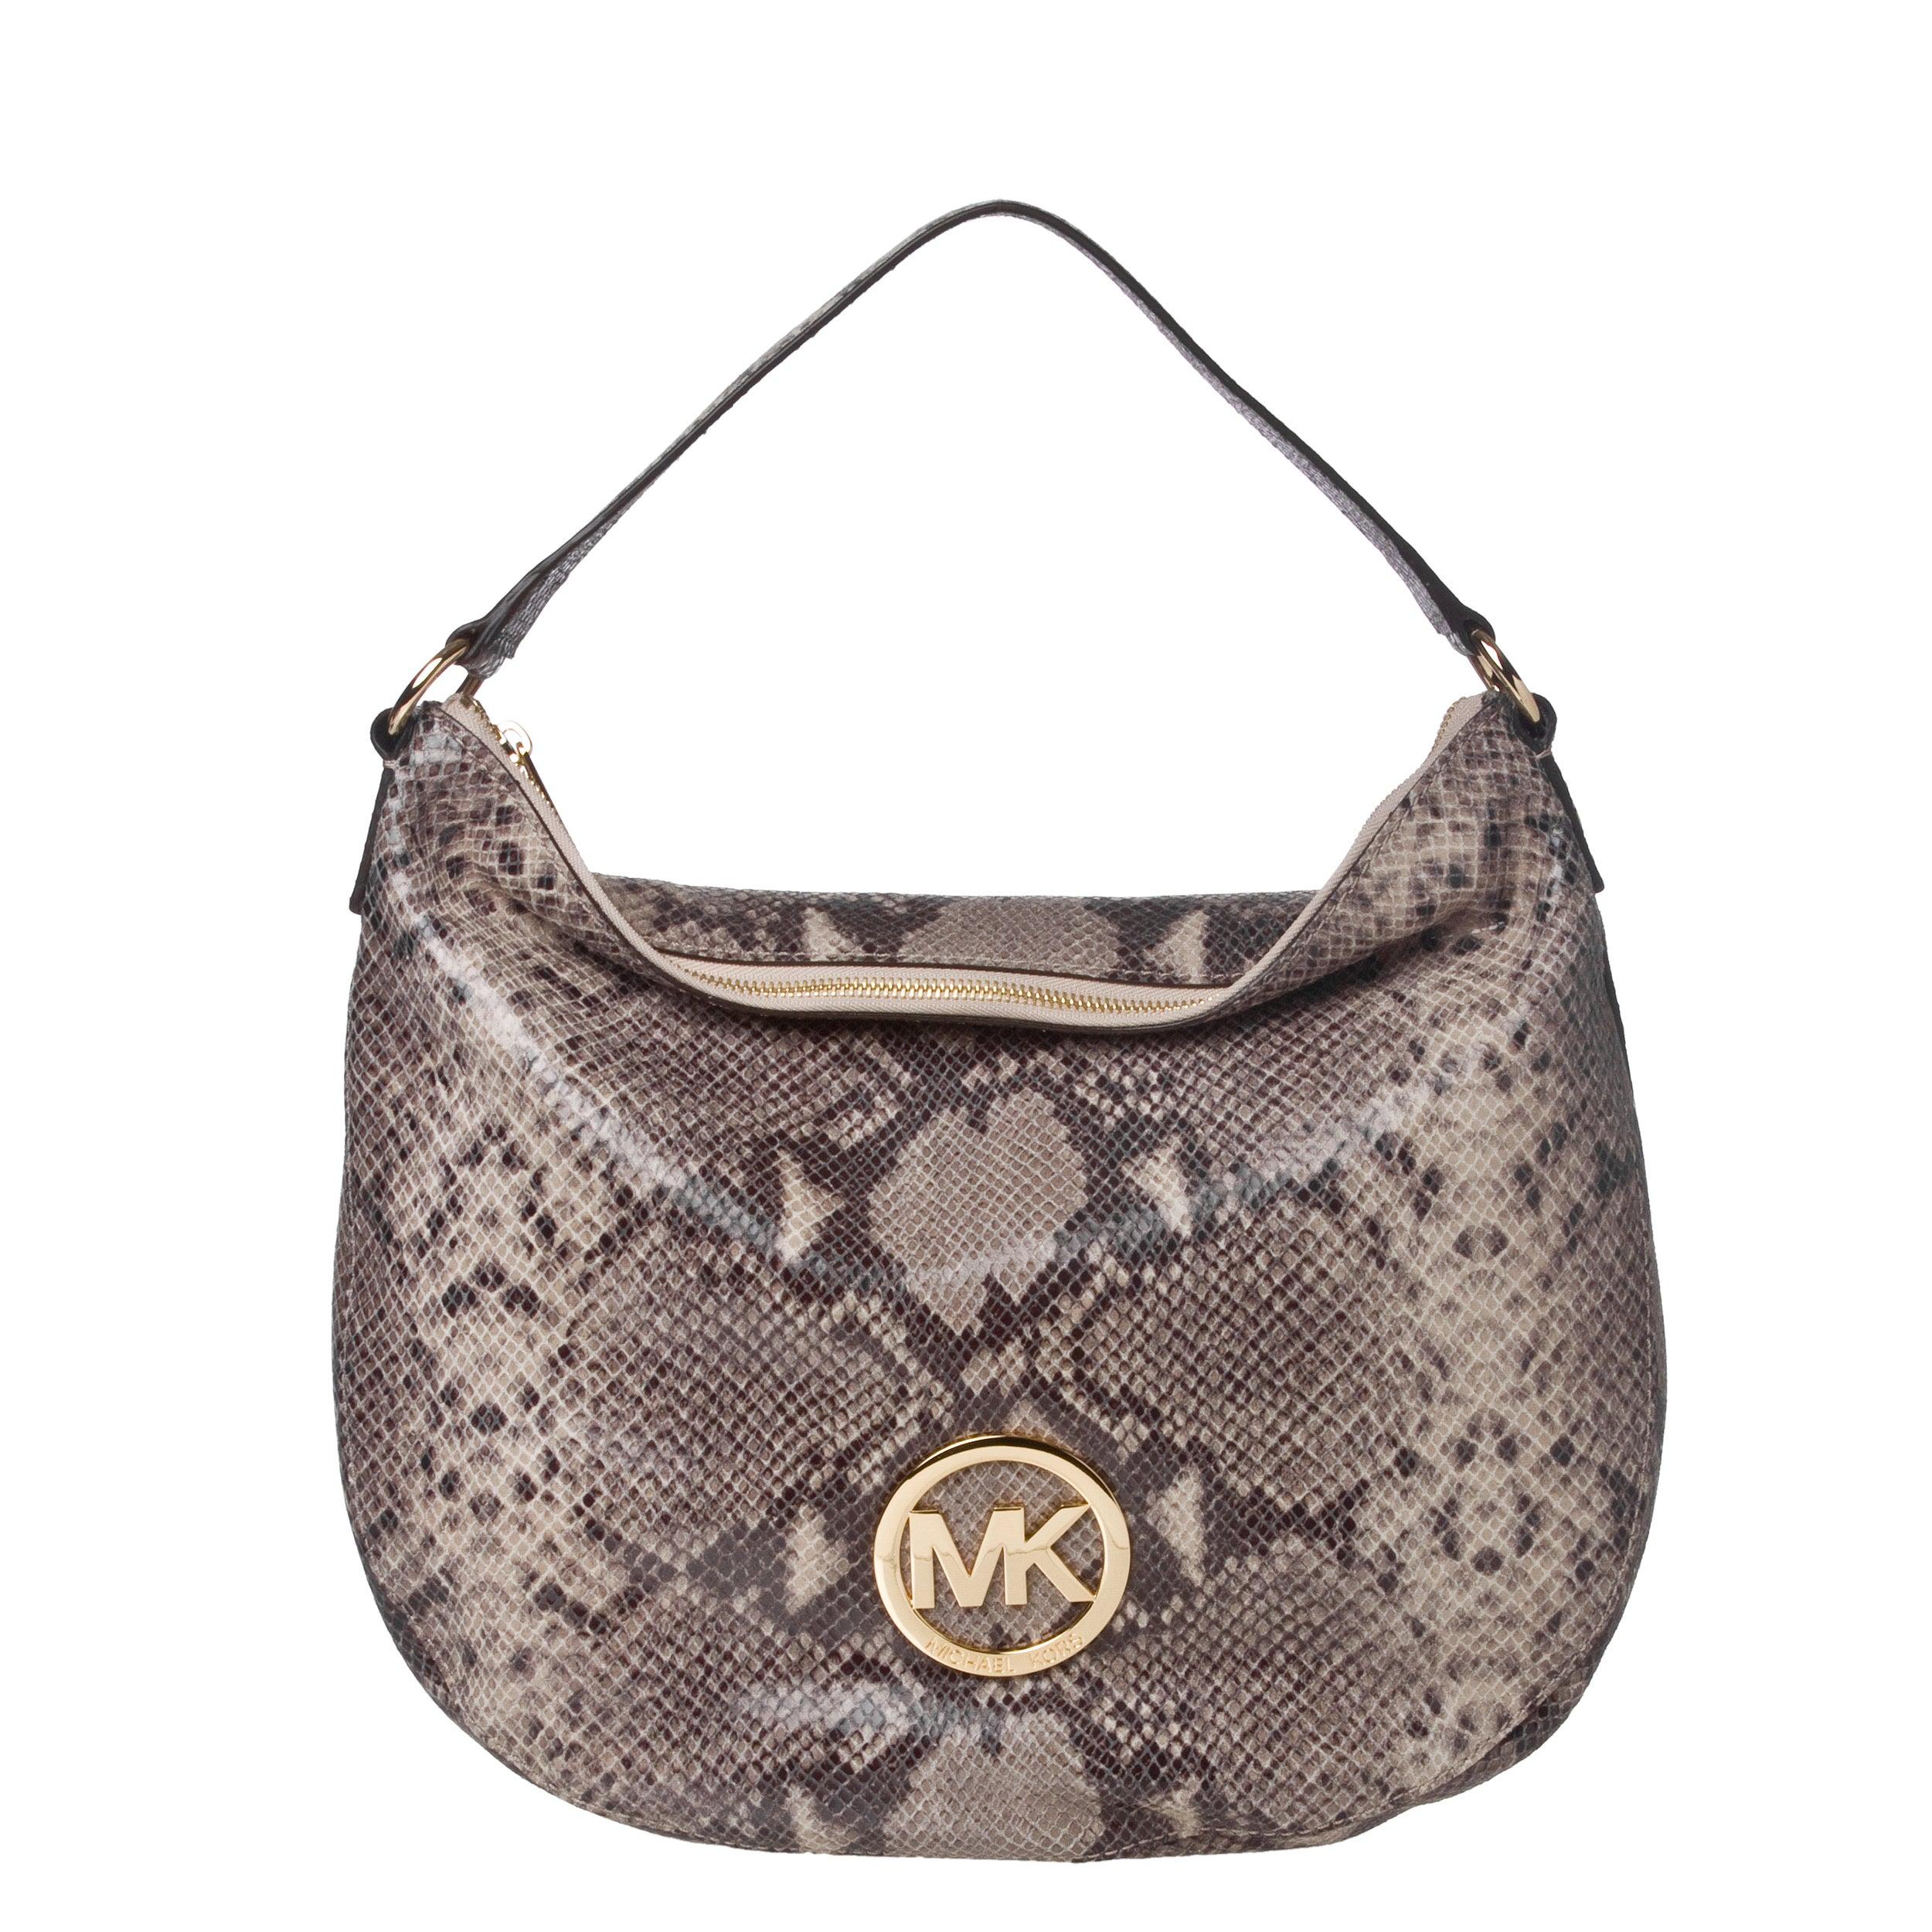 Michael Kors Sand Embossed Leather Hobo Bag